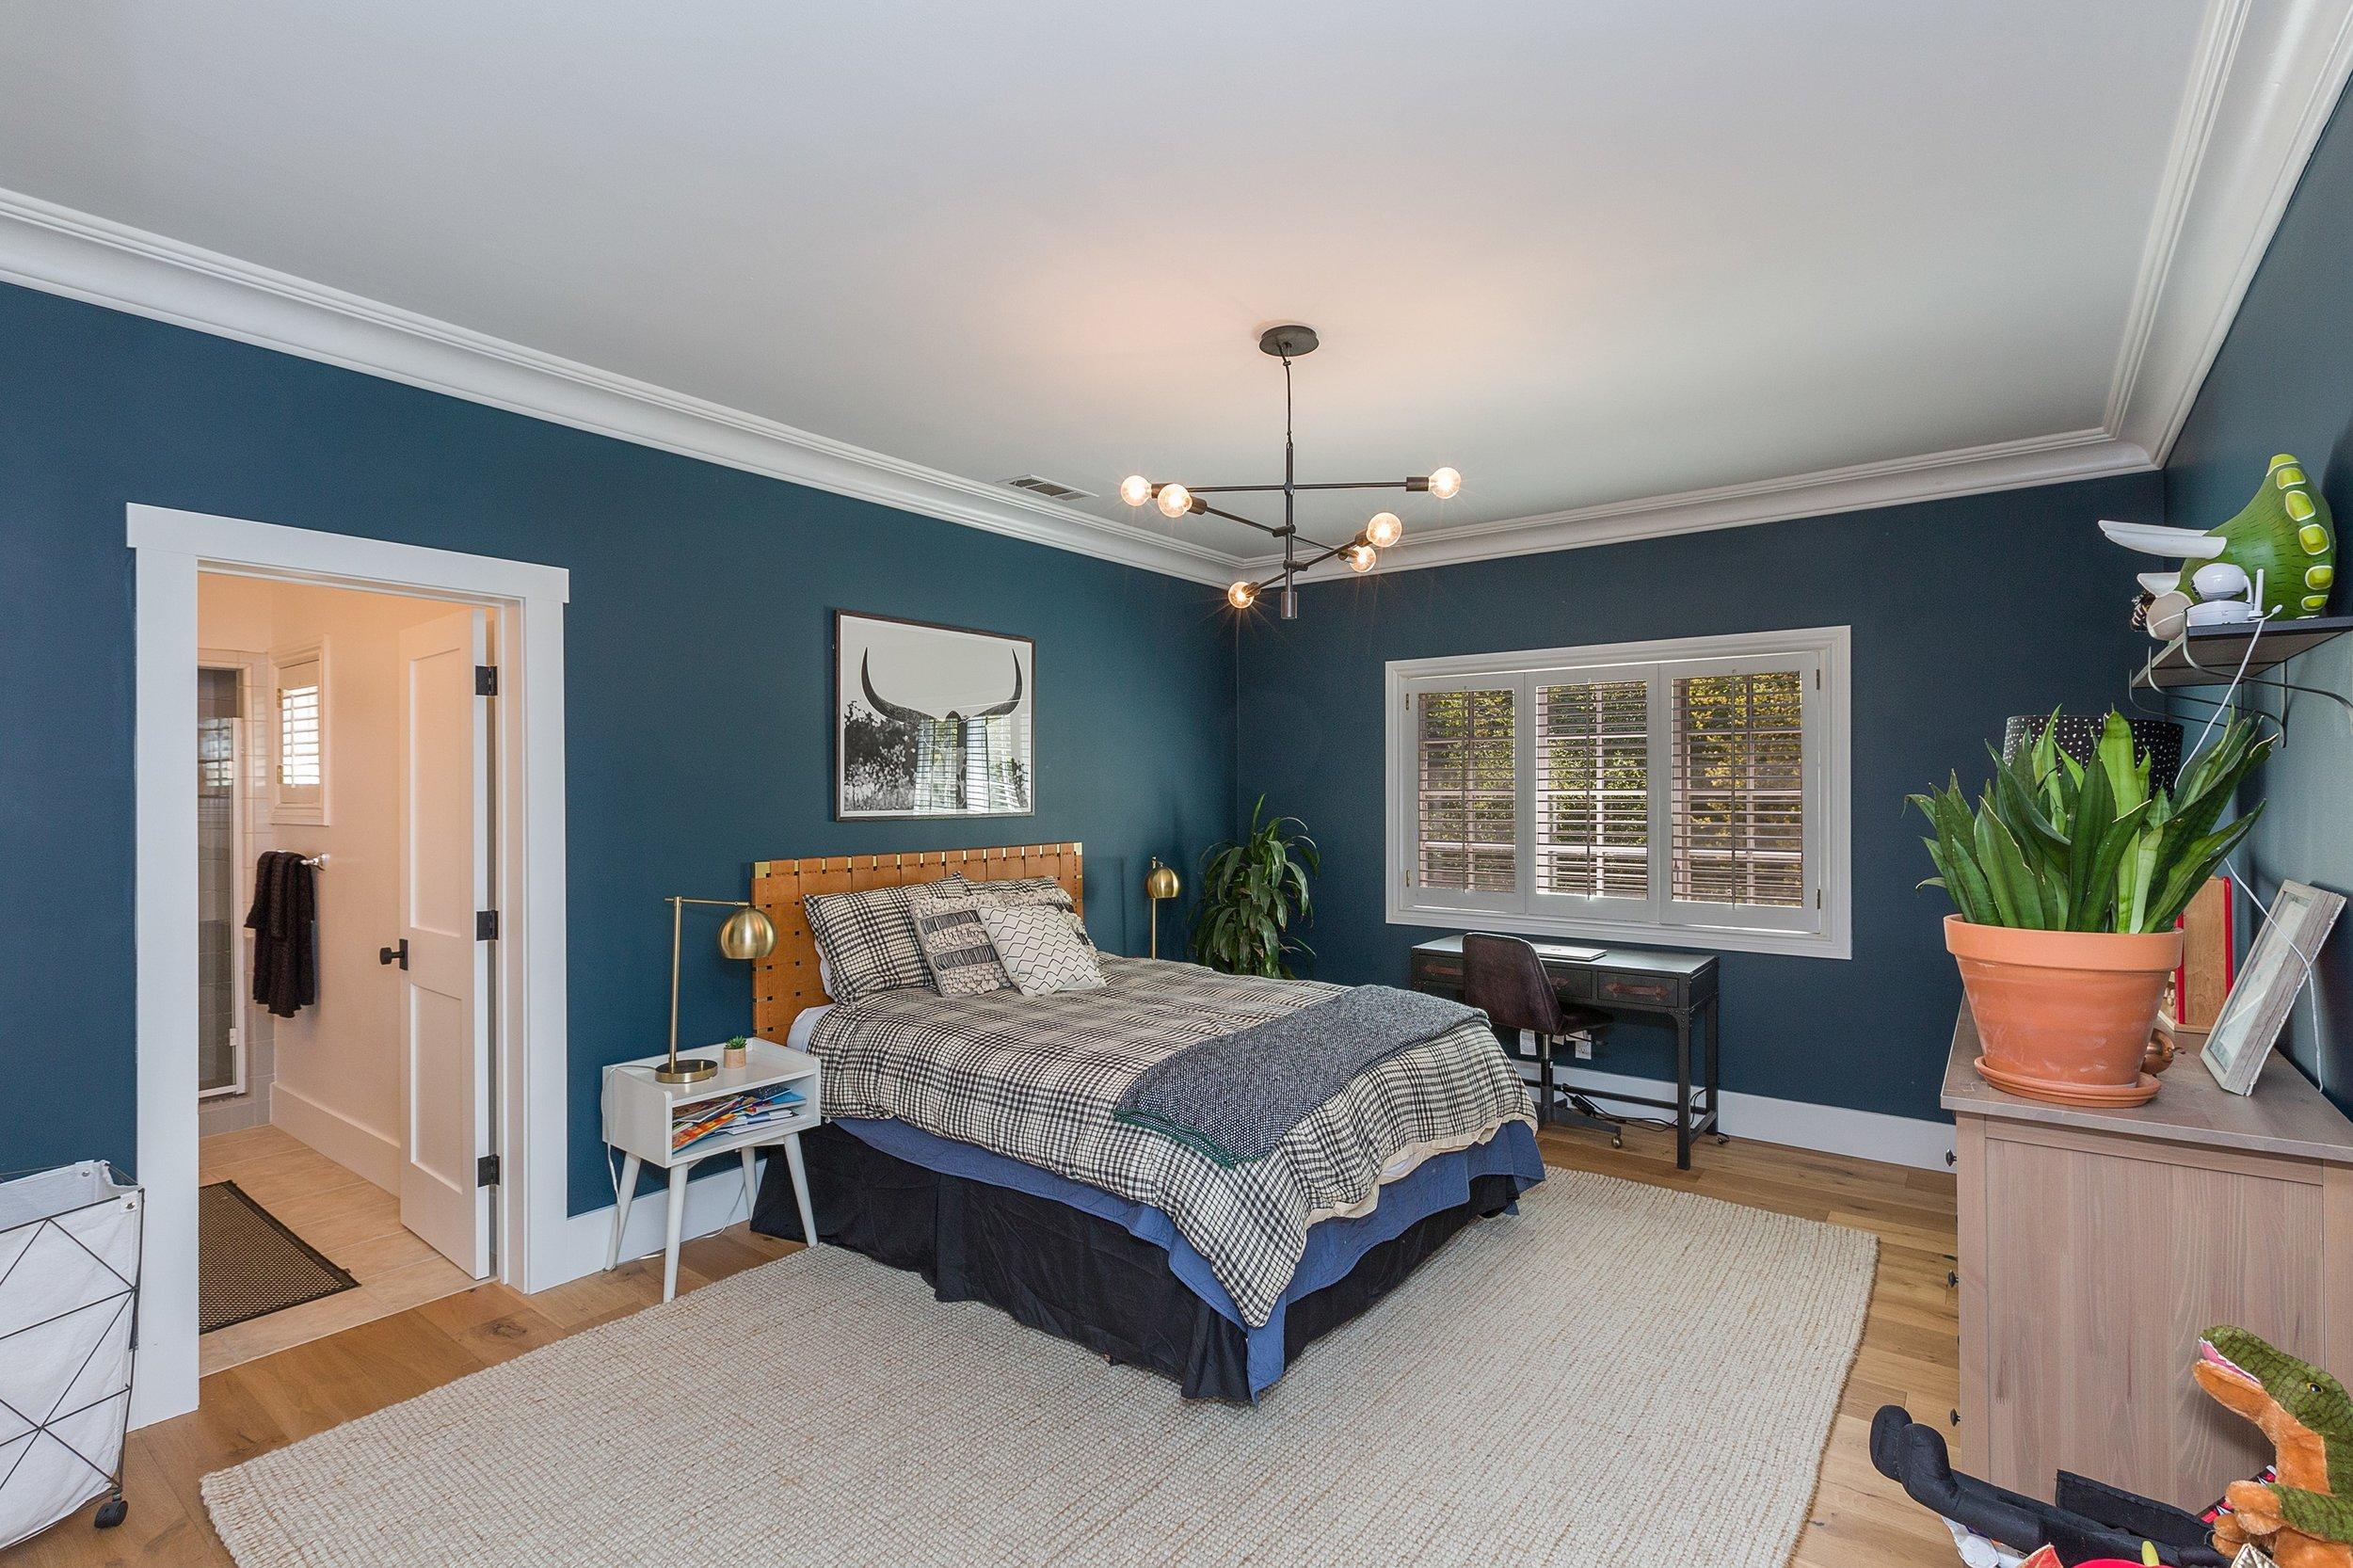 046_Bedroom.jpg